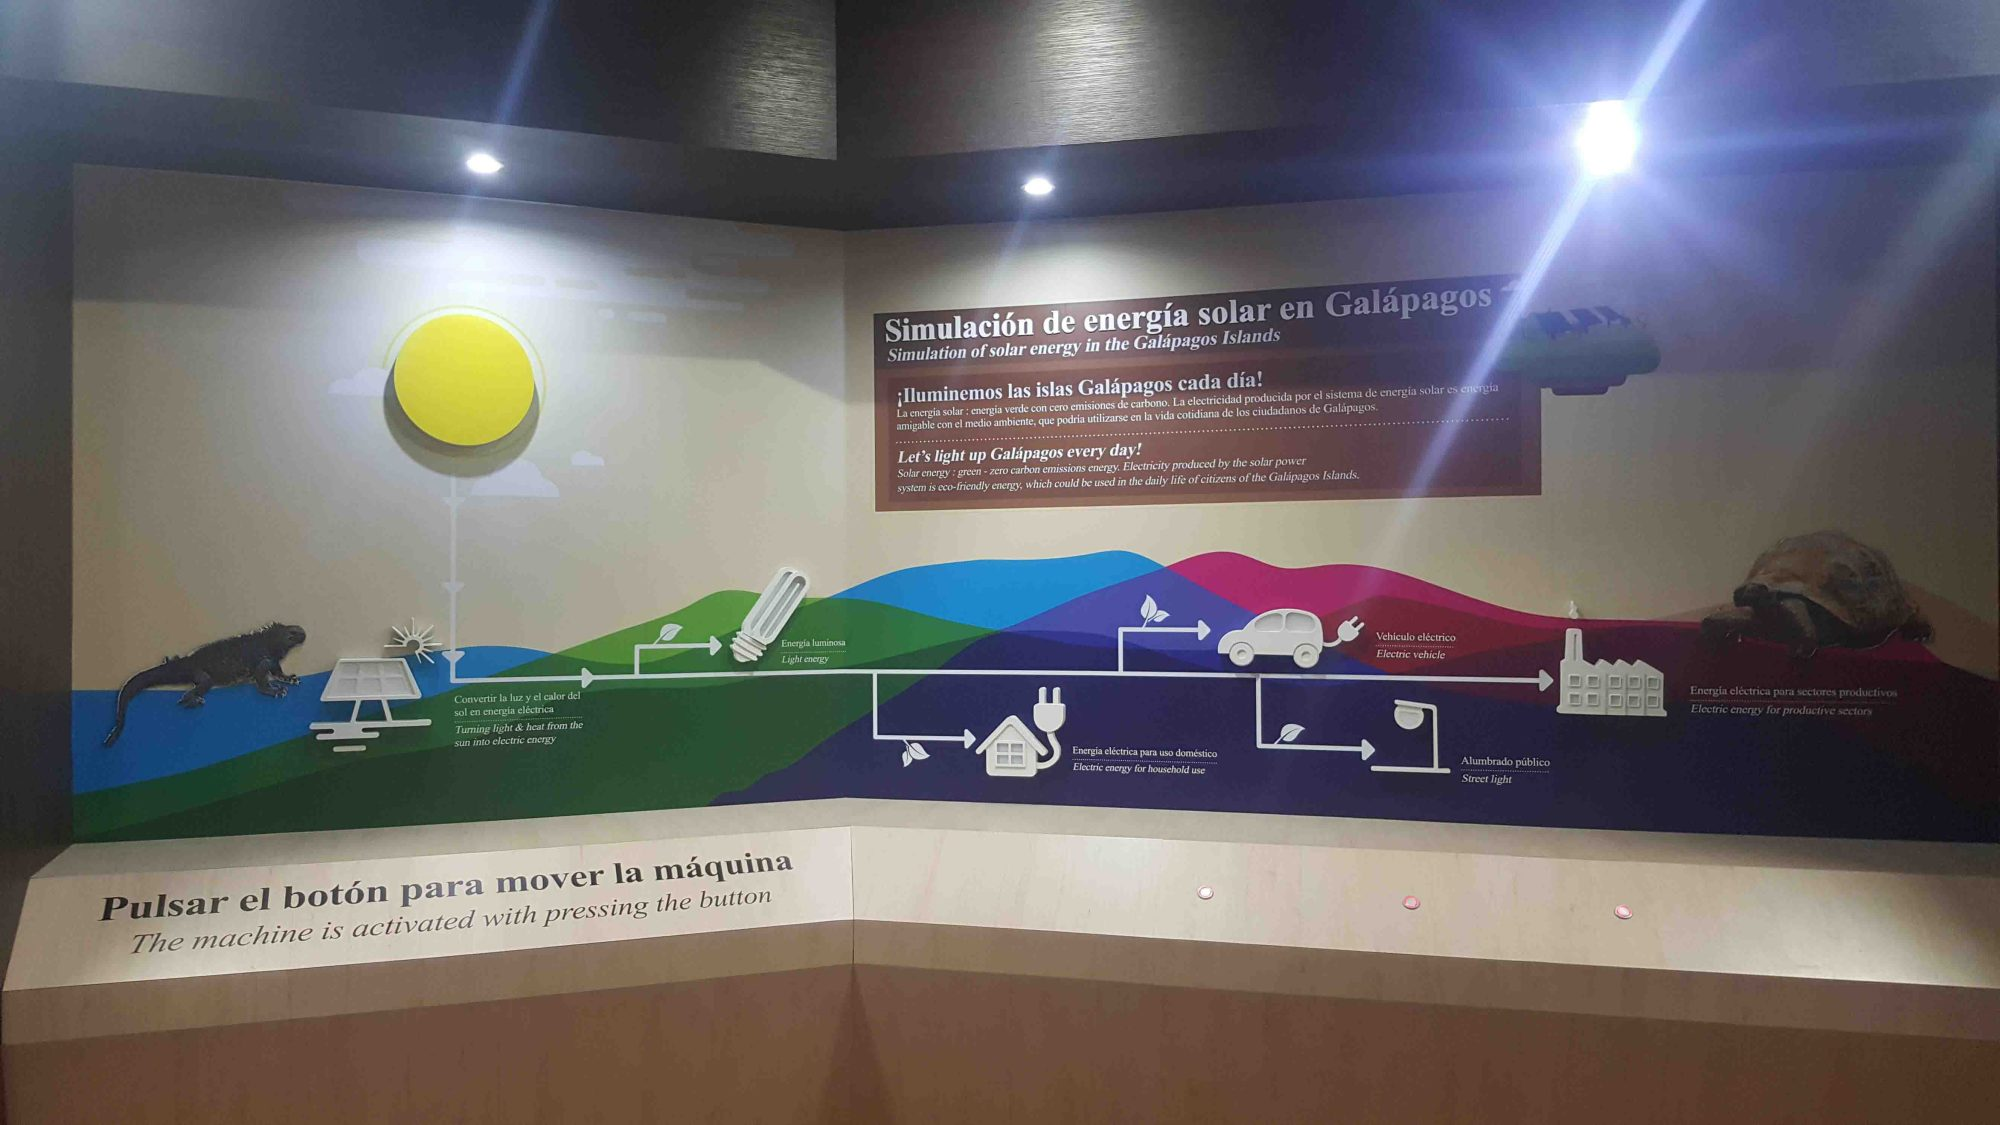 Energía renovable de Galápagos